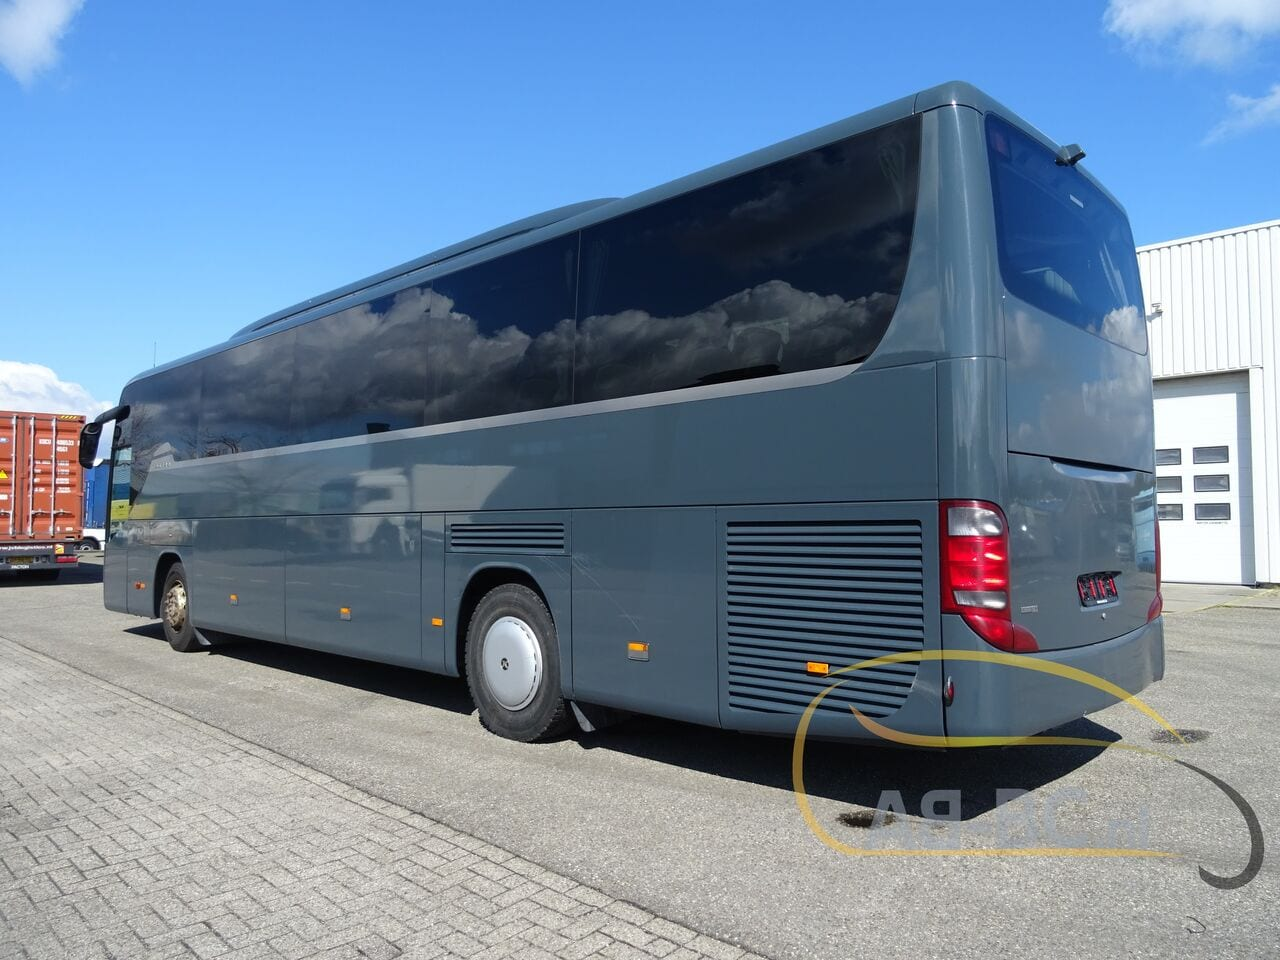 coach-busSETRA-S415-GT-HD-FINAL-EDITION-51-SEATS-LIFTBUS---1620381875262435658_big_2f30c2ed1fe917f3fbbce06dd7567a7d--21050713010665719300